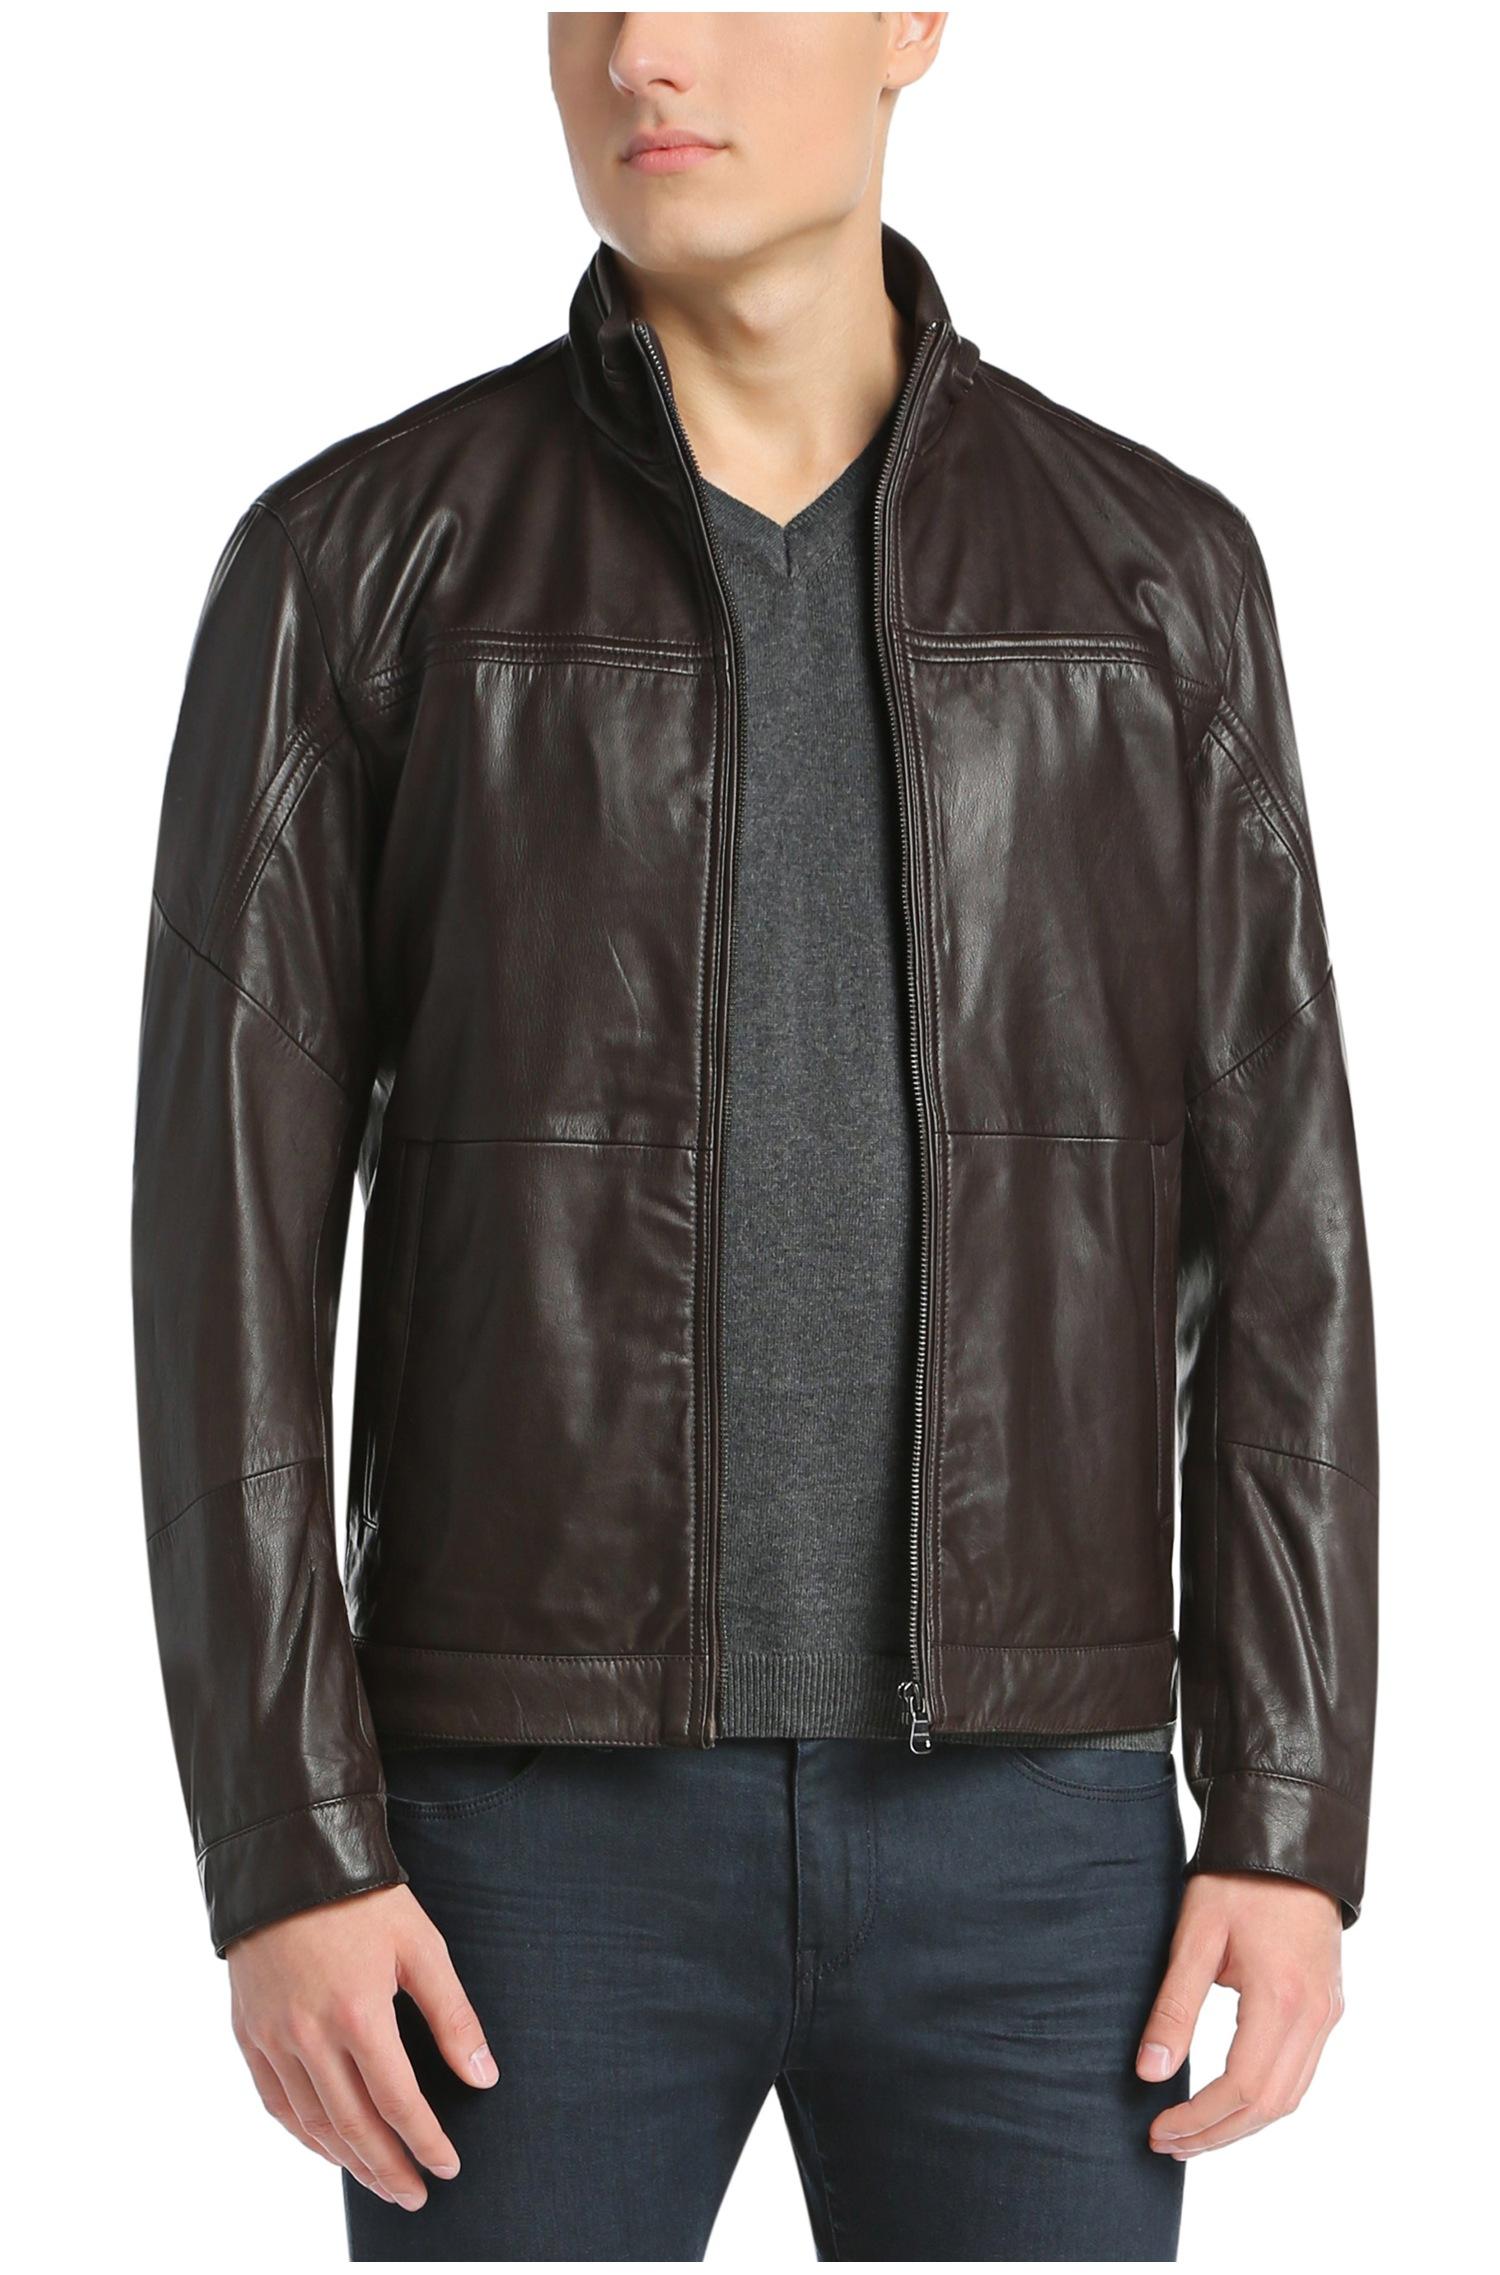 Leather jacket olx - Straight Cut Leather Jacket